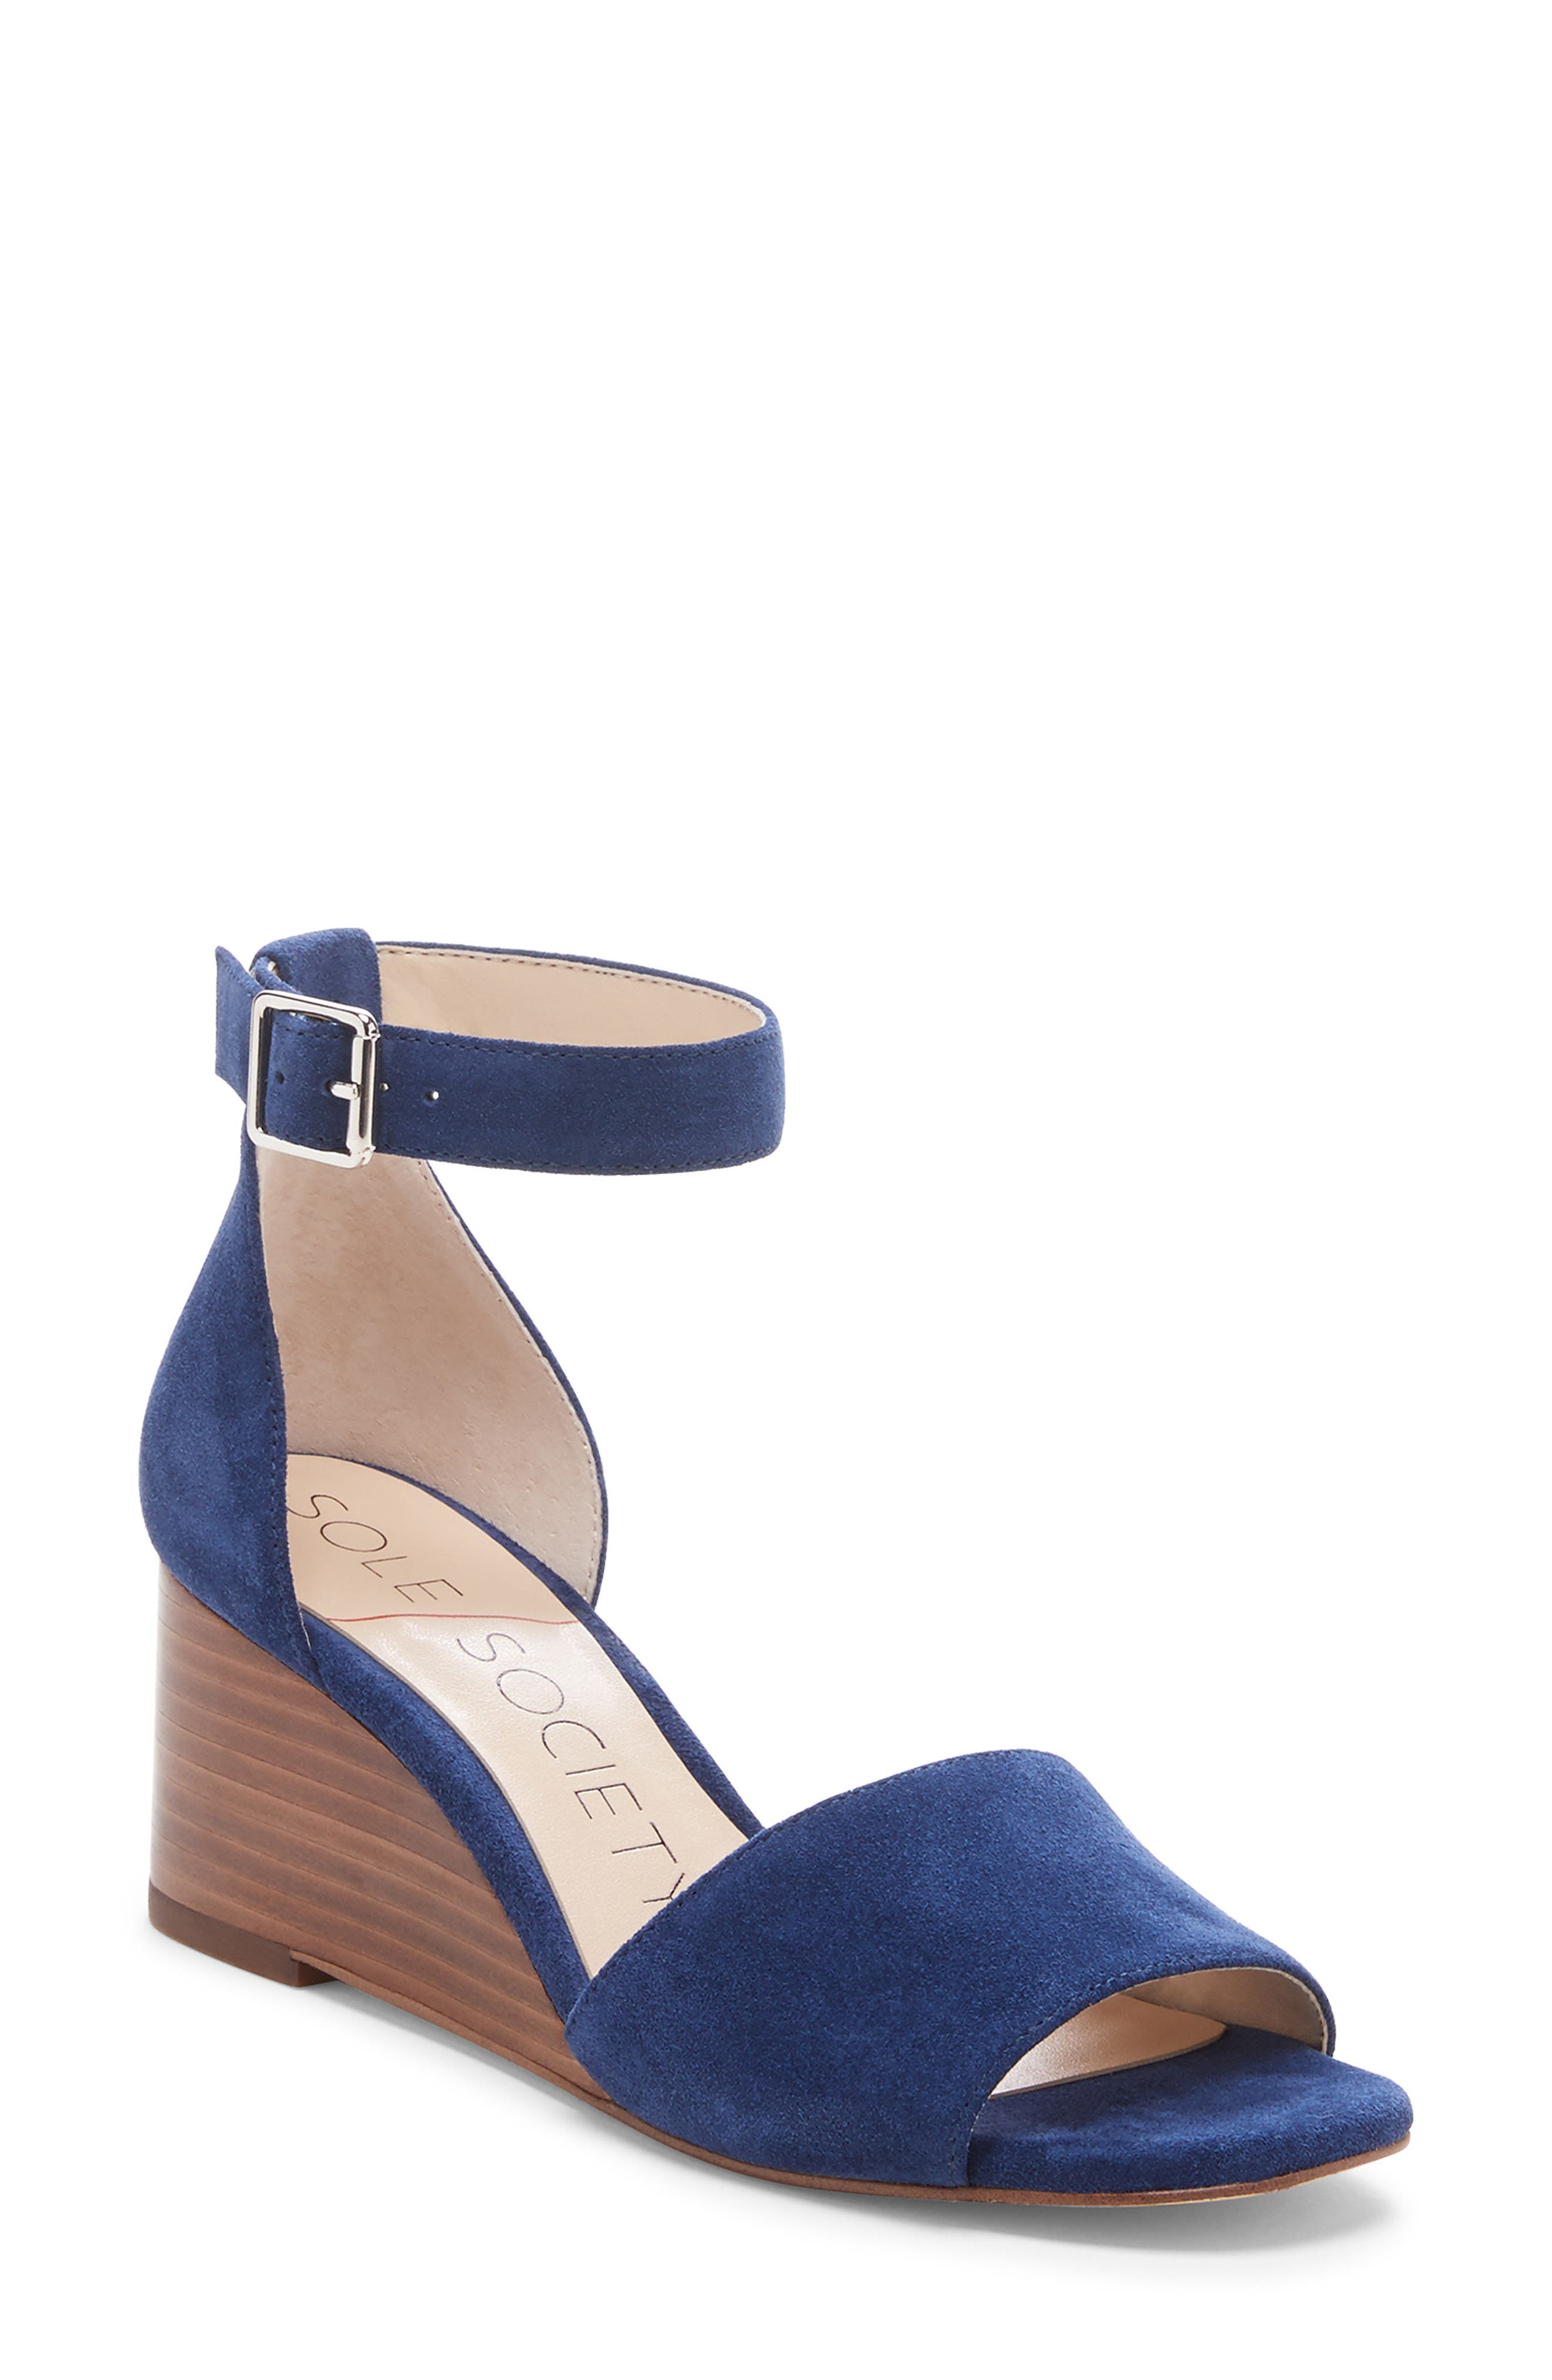 Kenia Wedge Sandal, Main, color, BLUE JEAN SUEDE